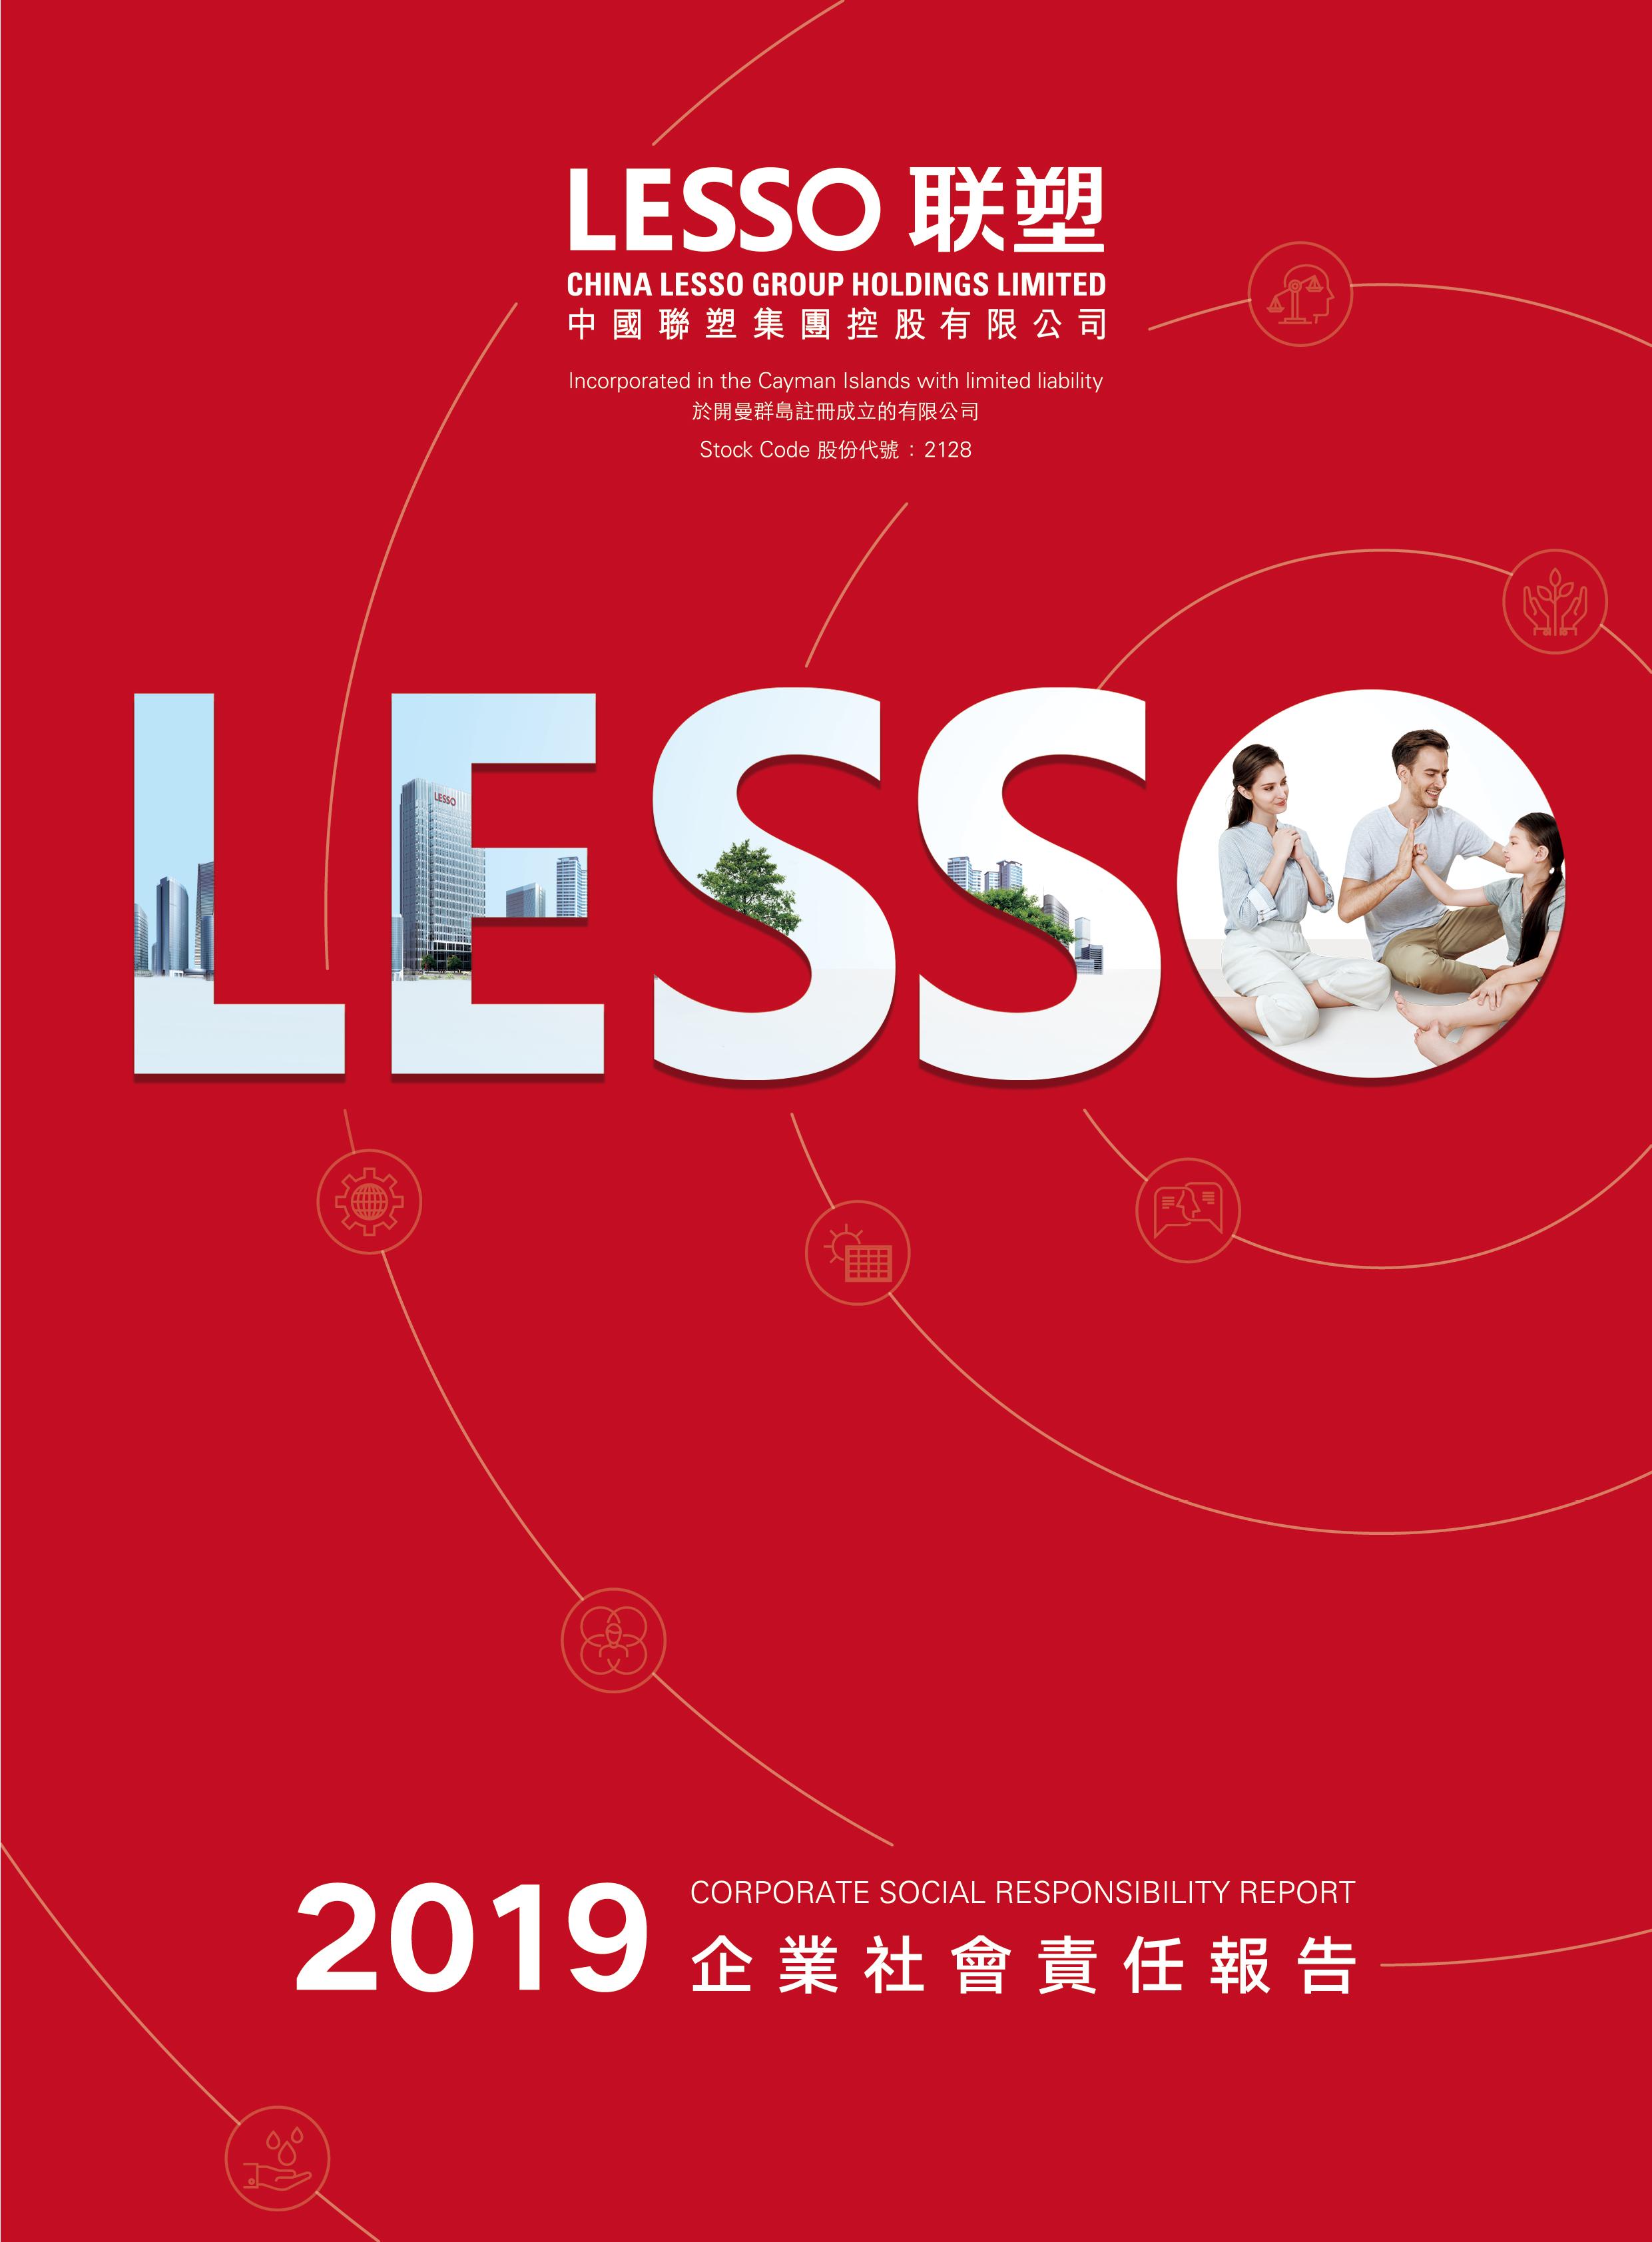 2019 CSR Report